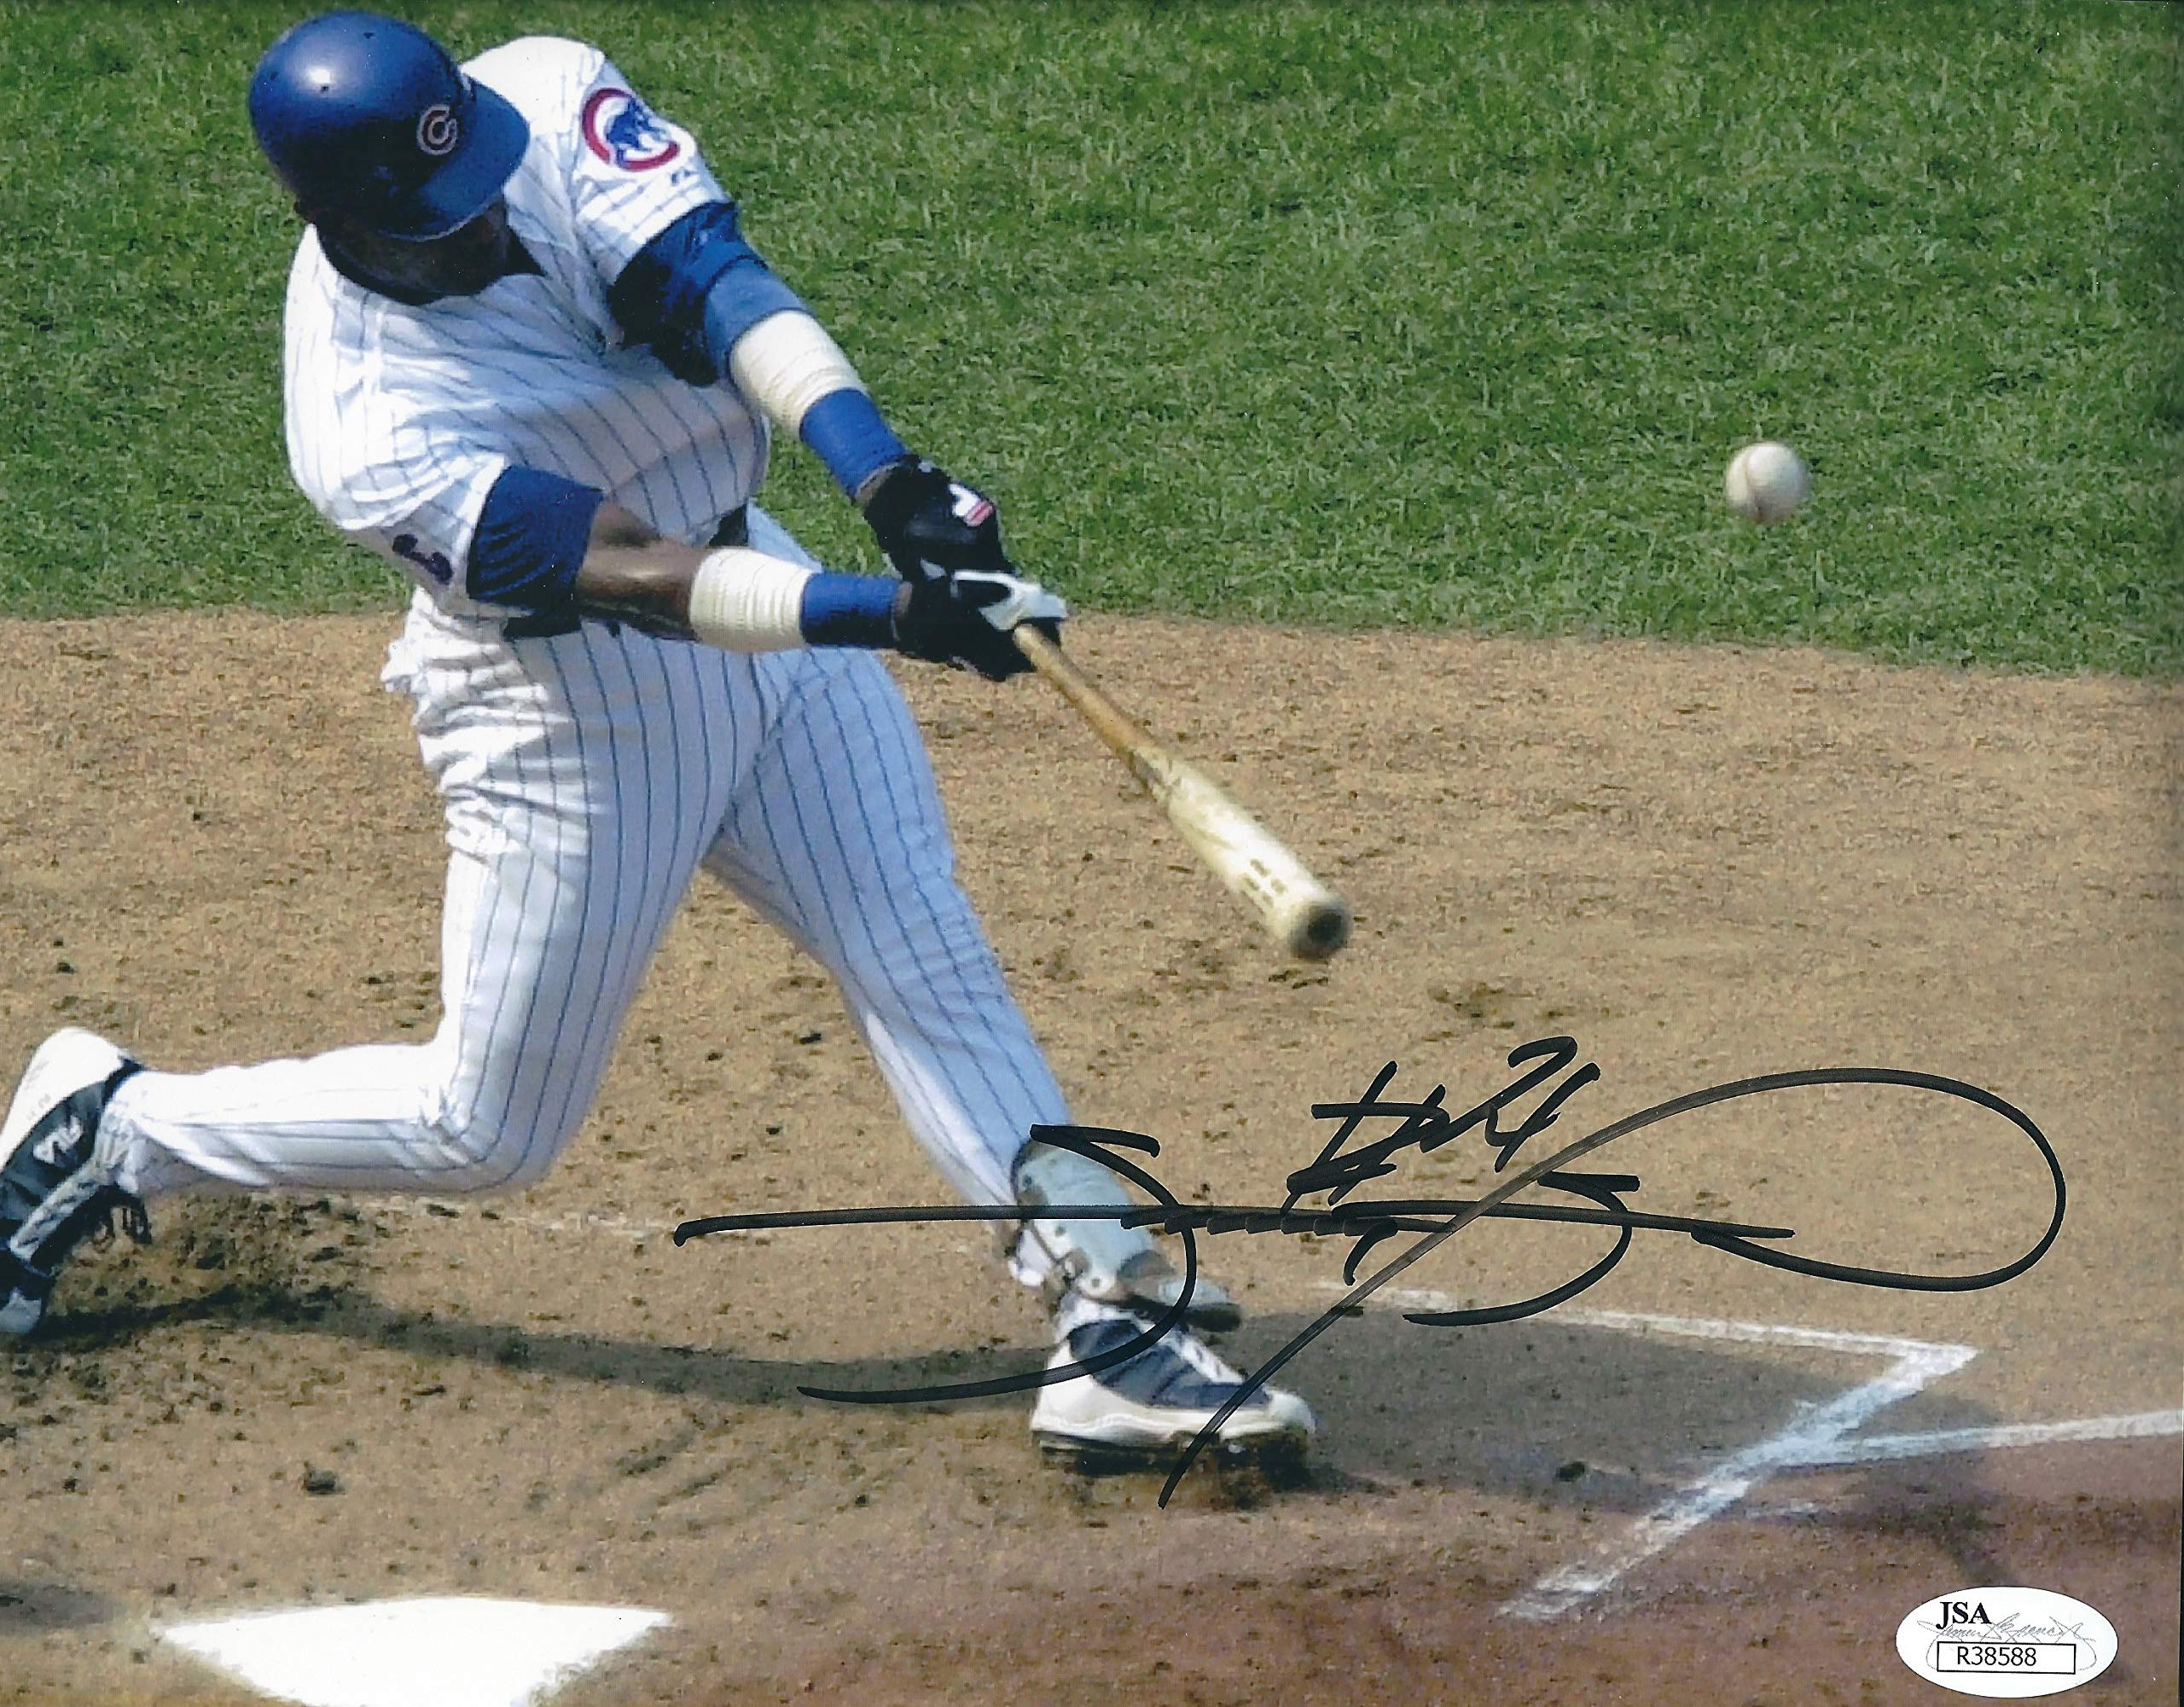 Autographed Sammy Sosa 8x10 Chicago Cubs Photo JSA